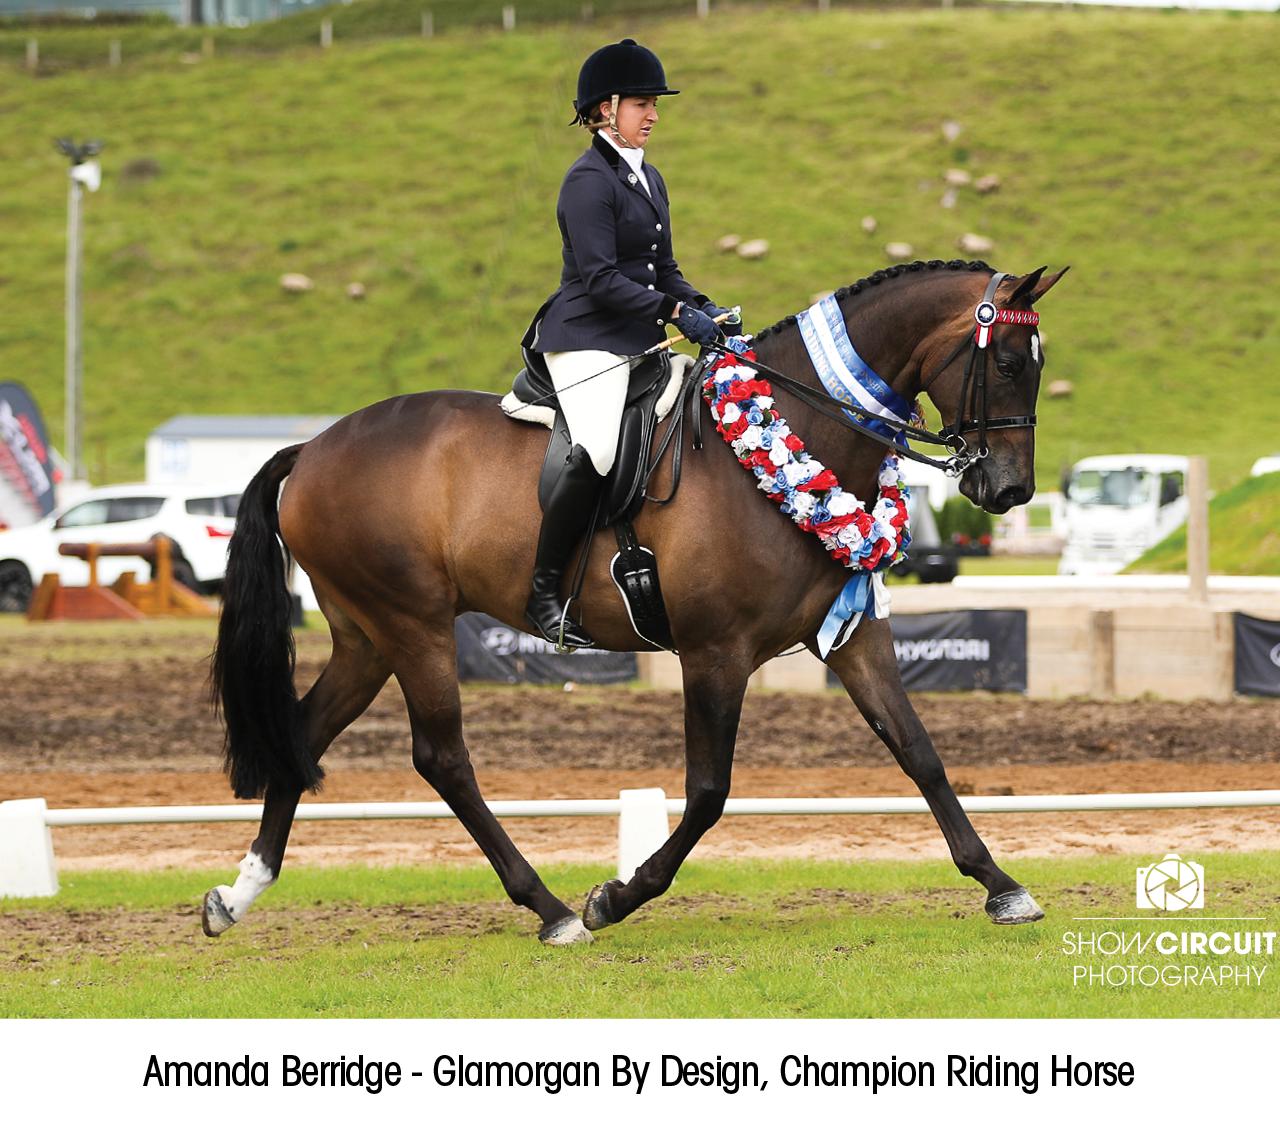 Amanda Berridge - Glamorgan By Design, Champion Riding Horse